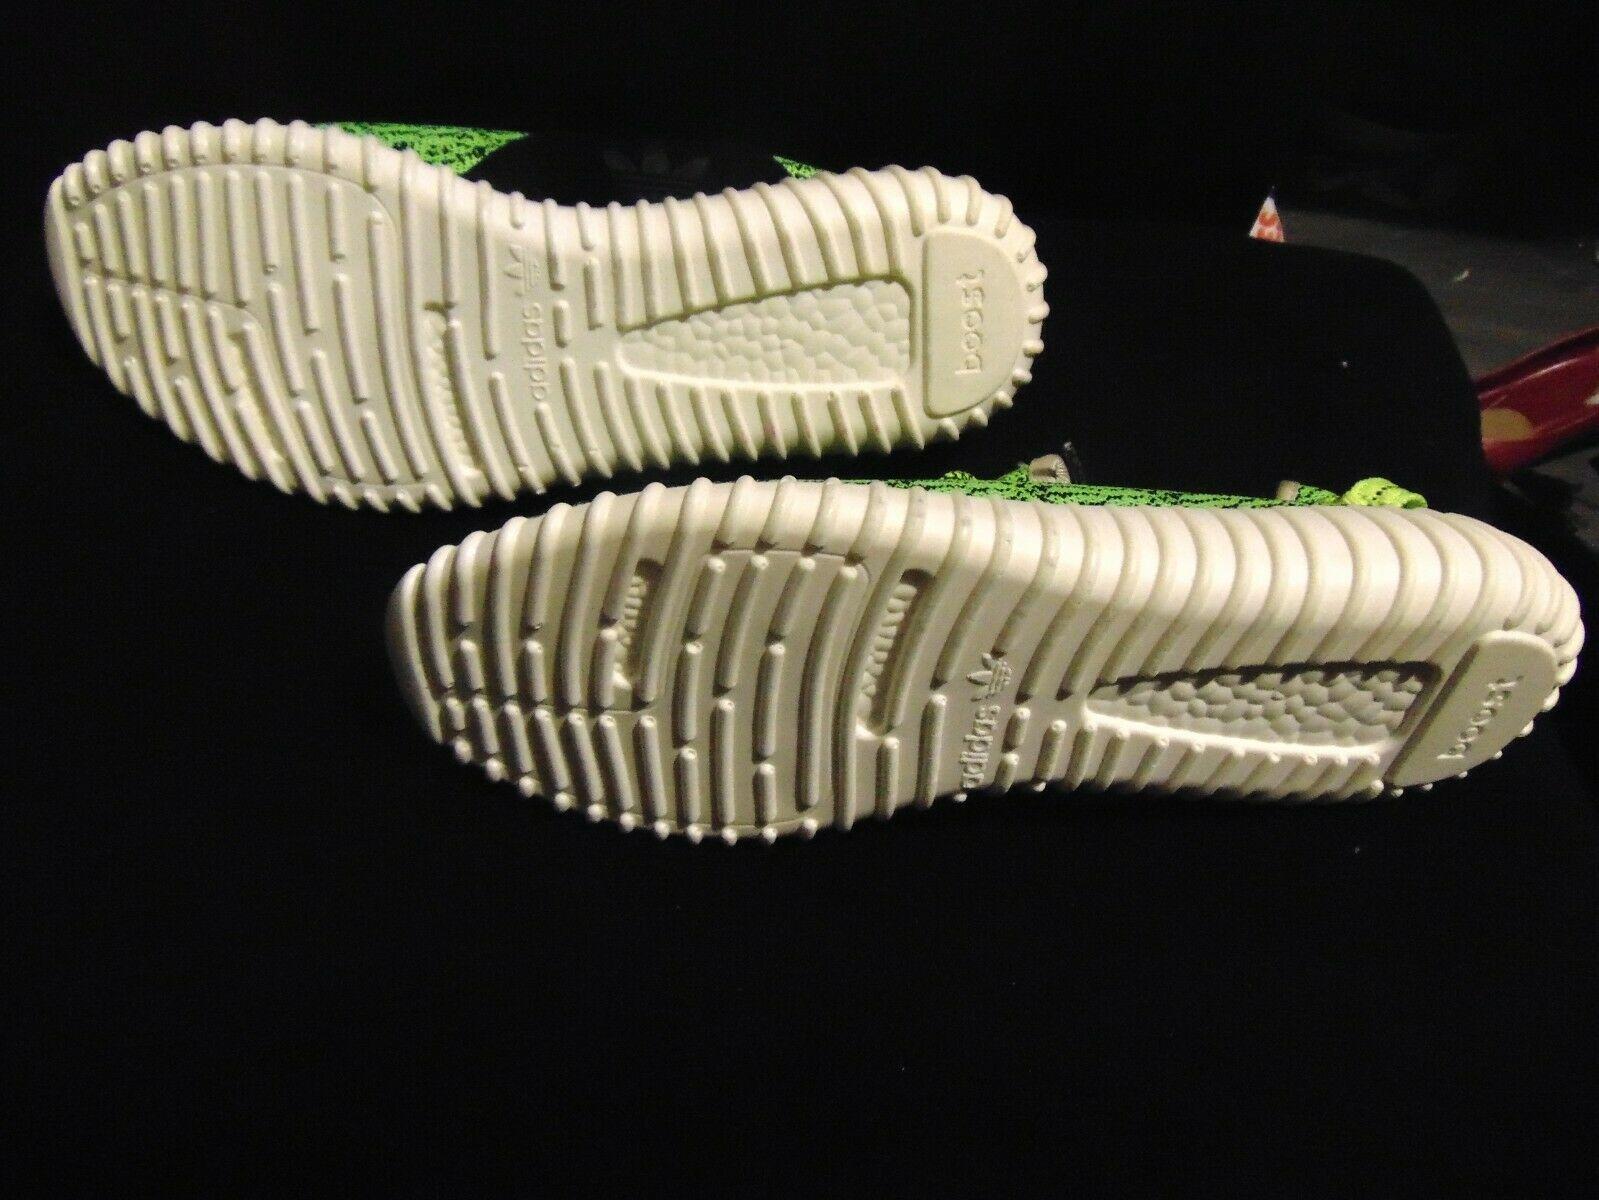 Adidas Yeezy Boost 350 Turtle Dove Size 9 image 4